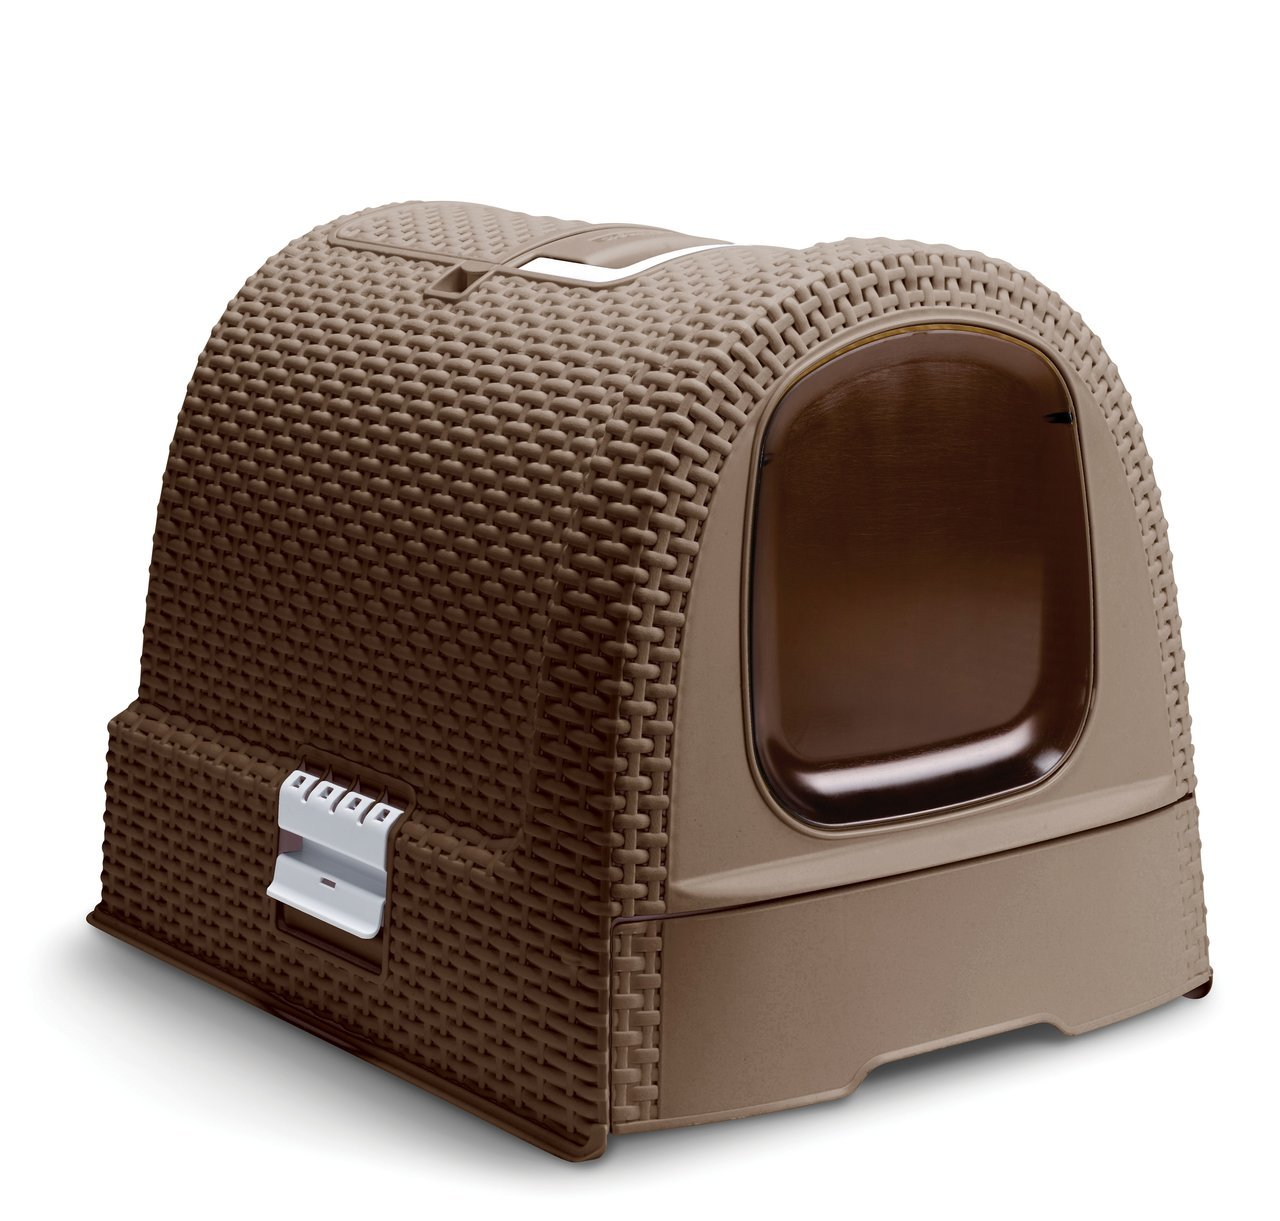 katzentoilette online kaufen bei zoologo zoologo. Black Bedroom Furniture Sets. Home Design Ideas